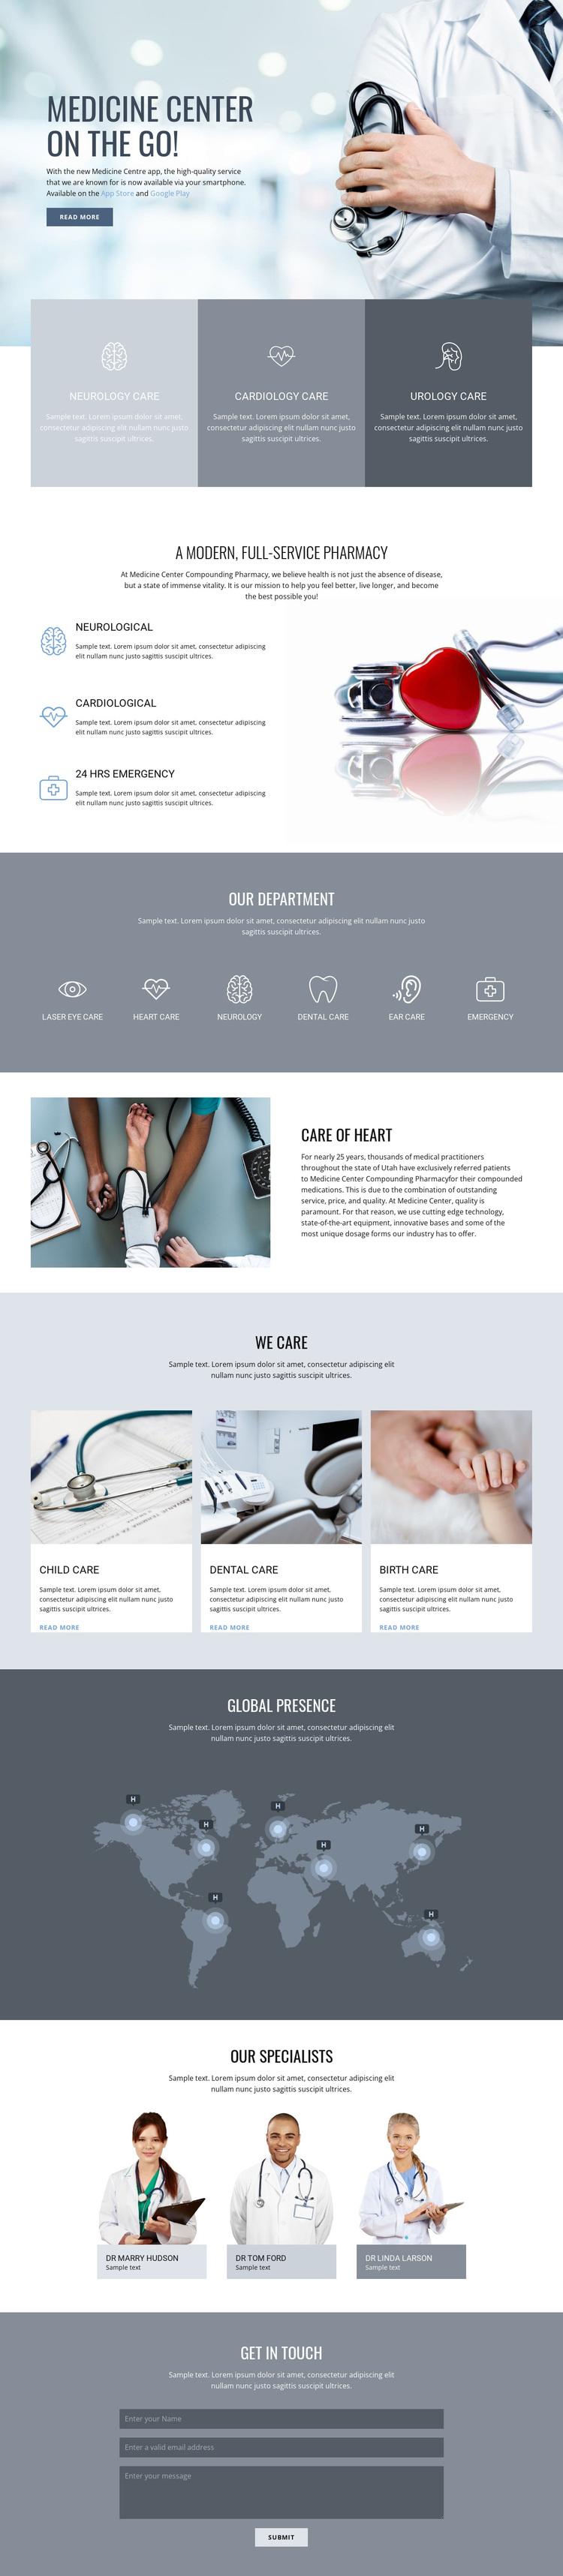 Pharmacy and medicine Joomla Page Builder